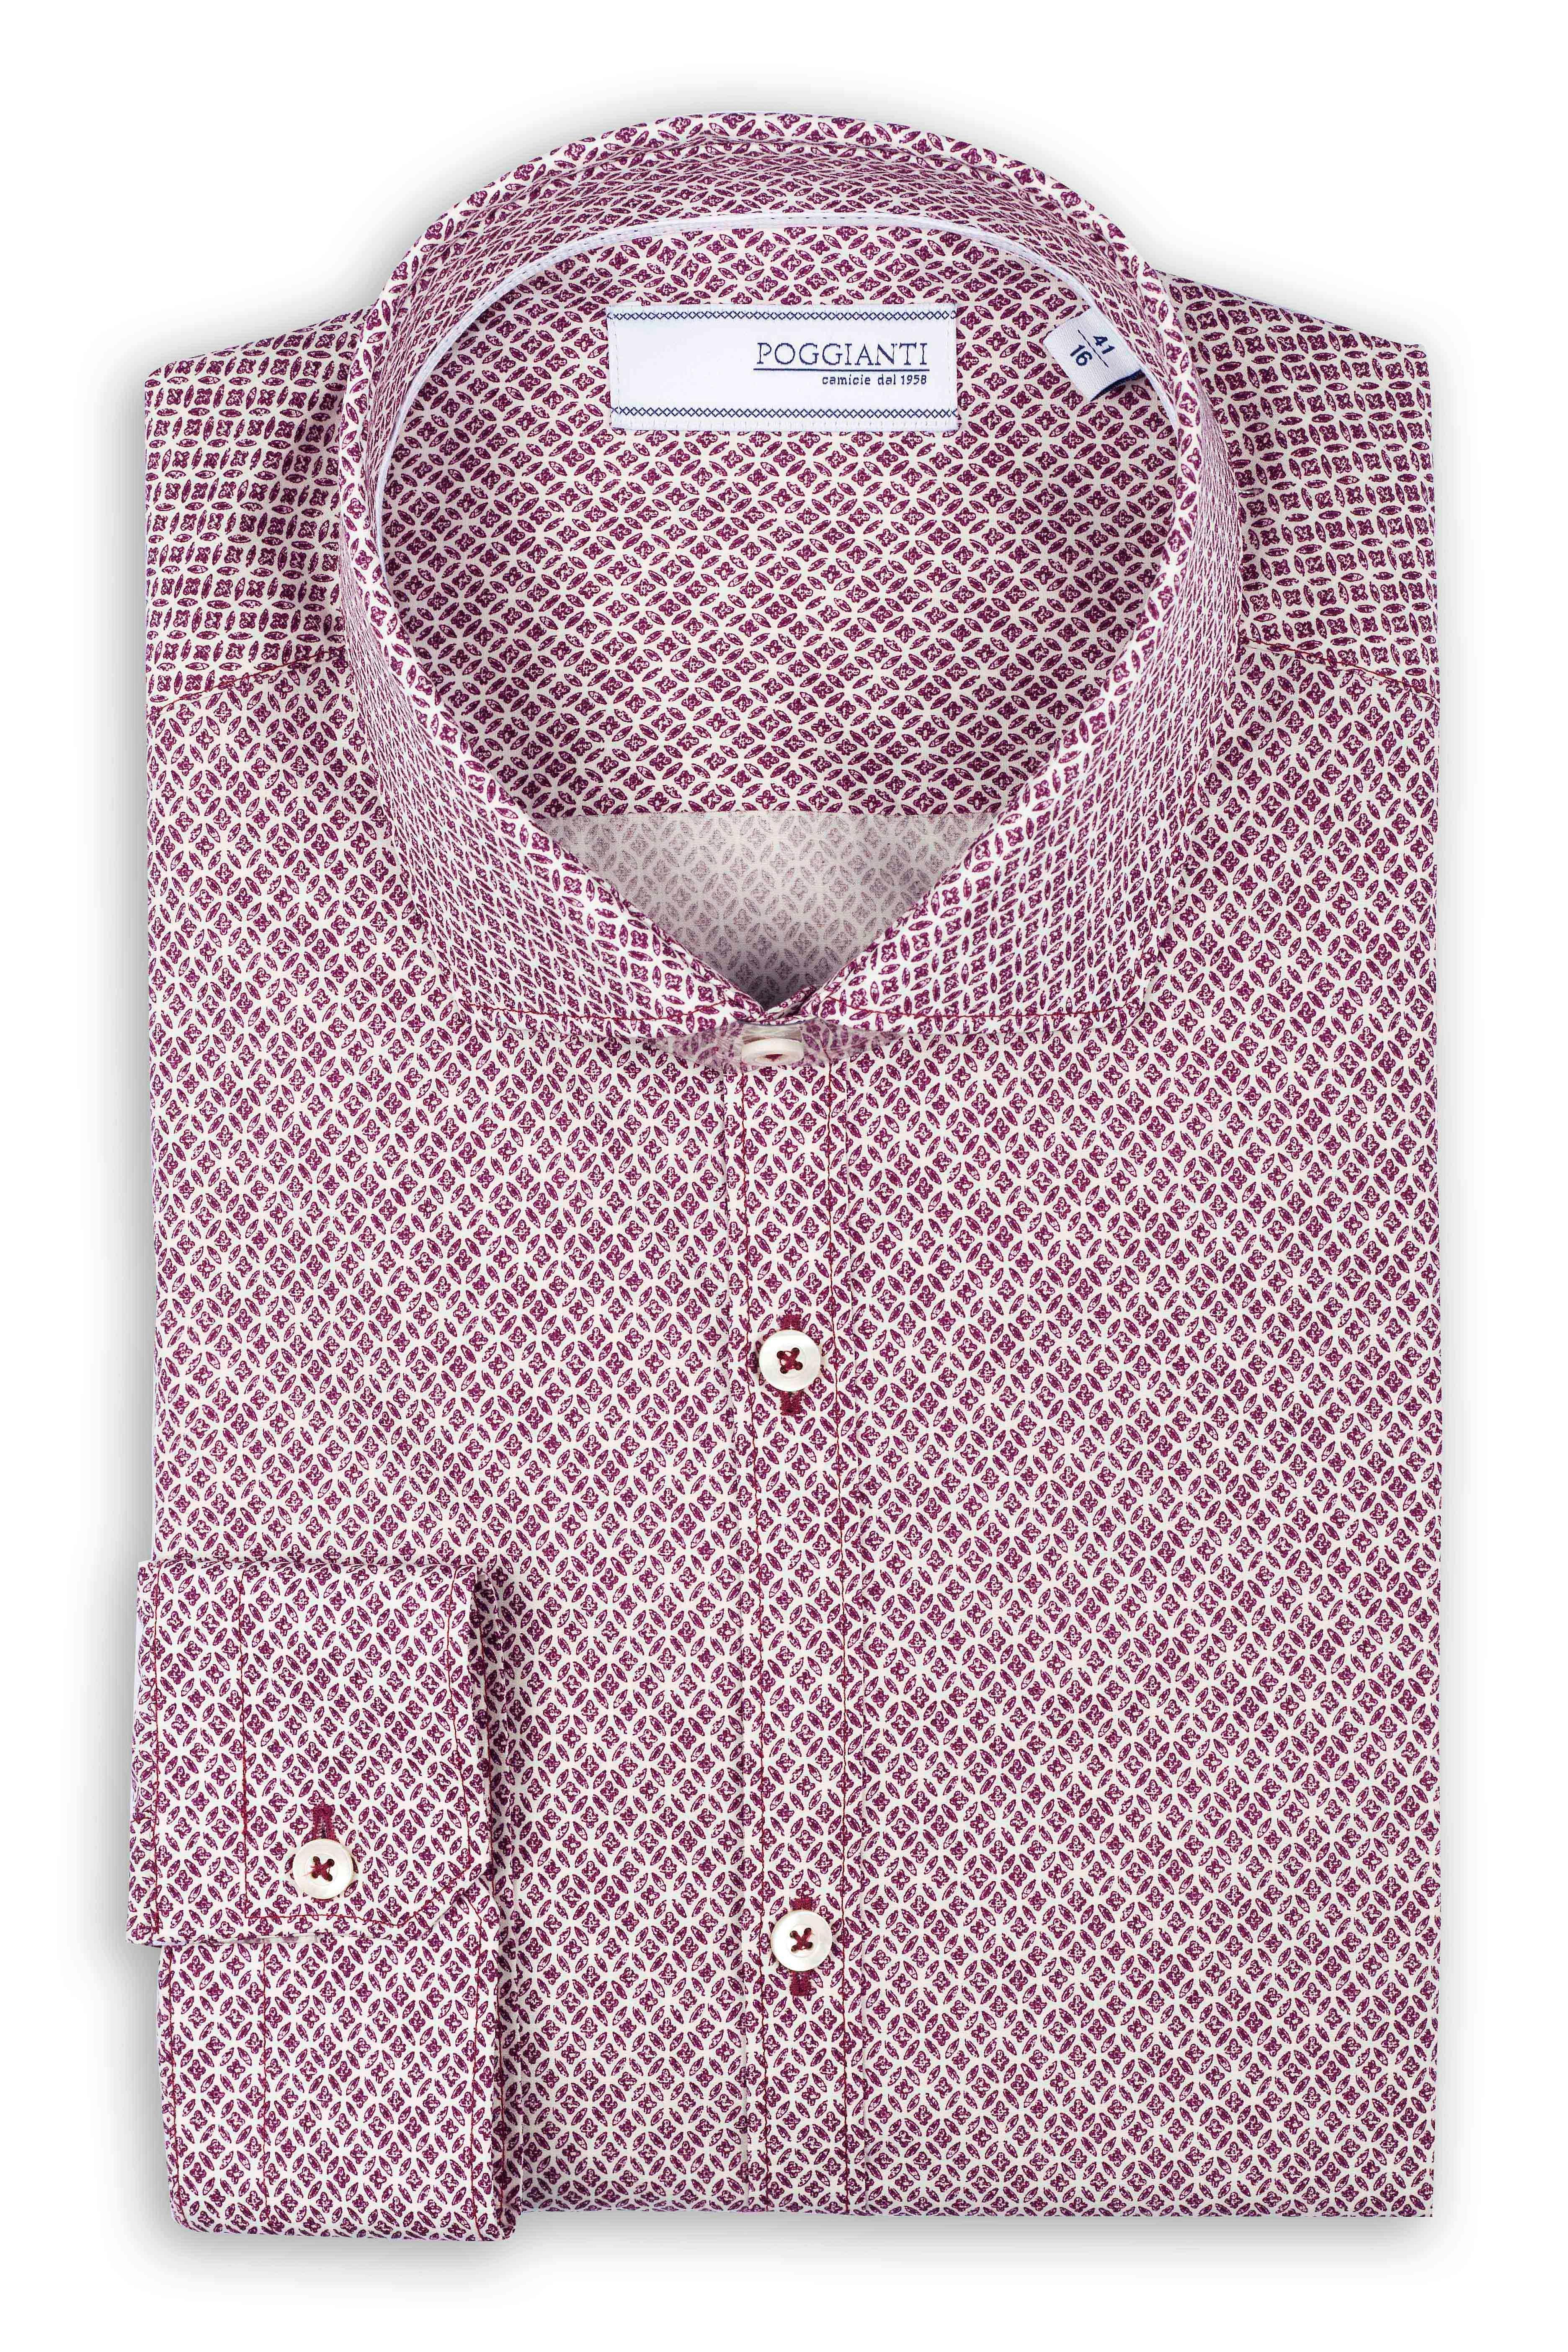 Fabio Giovanni Fantina Shirt - Mens High Quality Italian Smart and Casual Floral Print Shirt